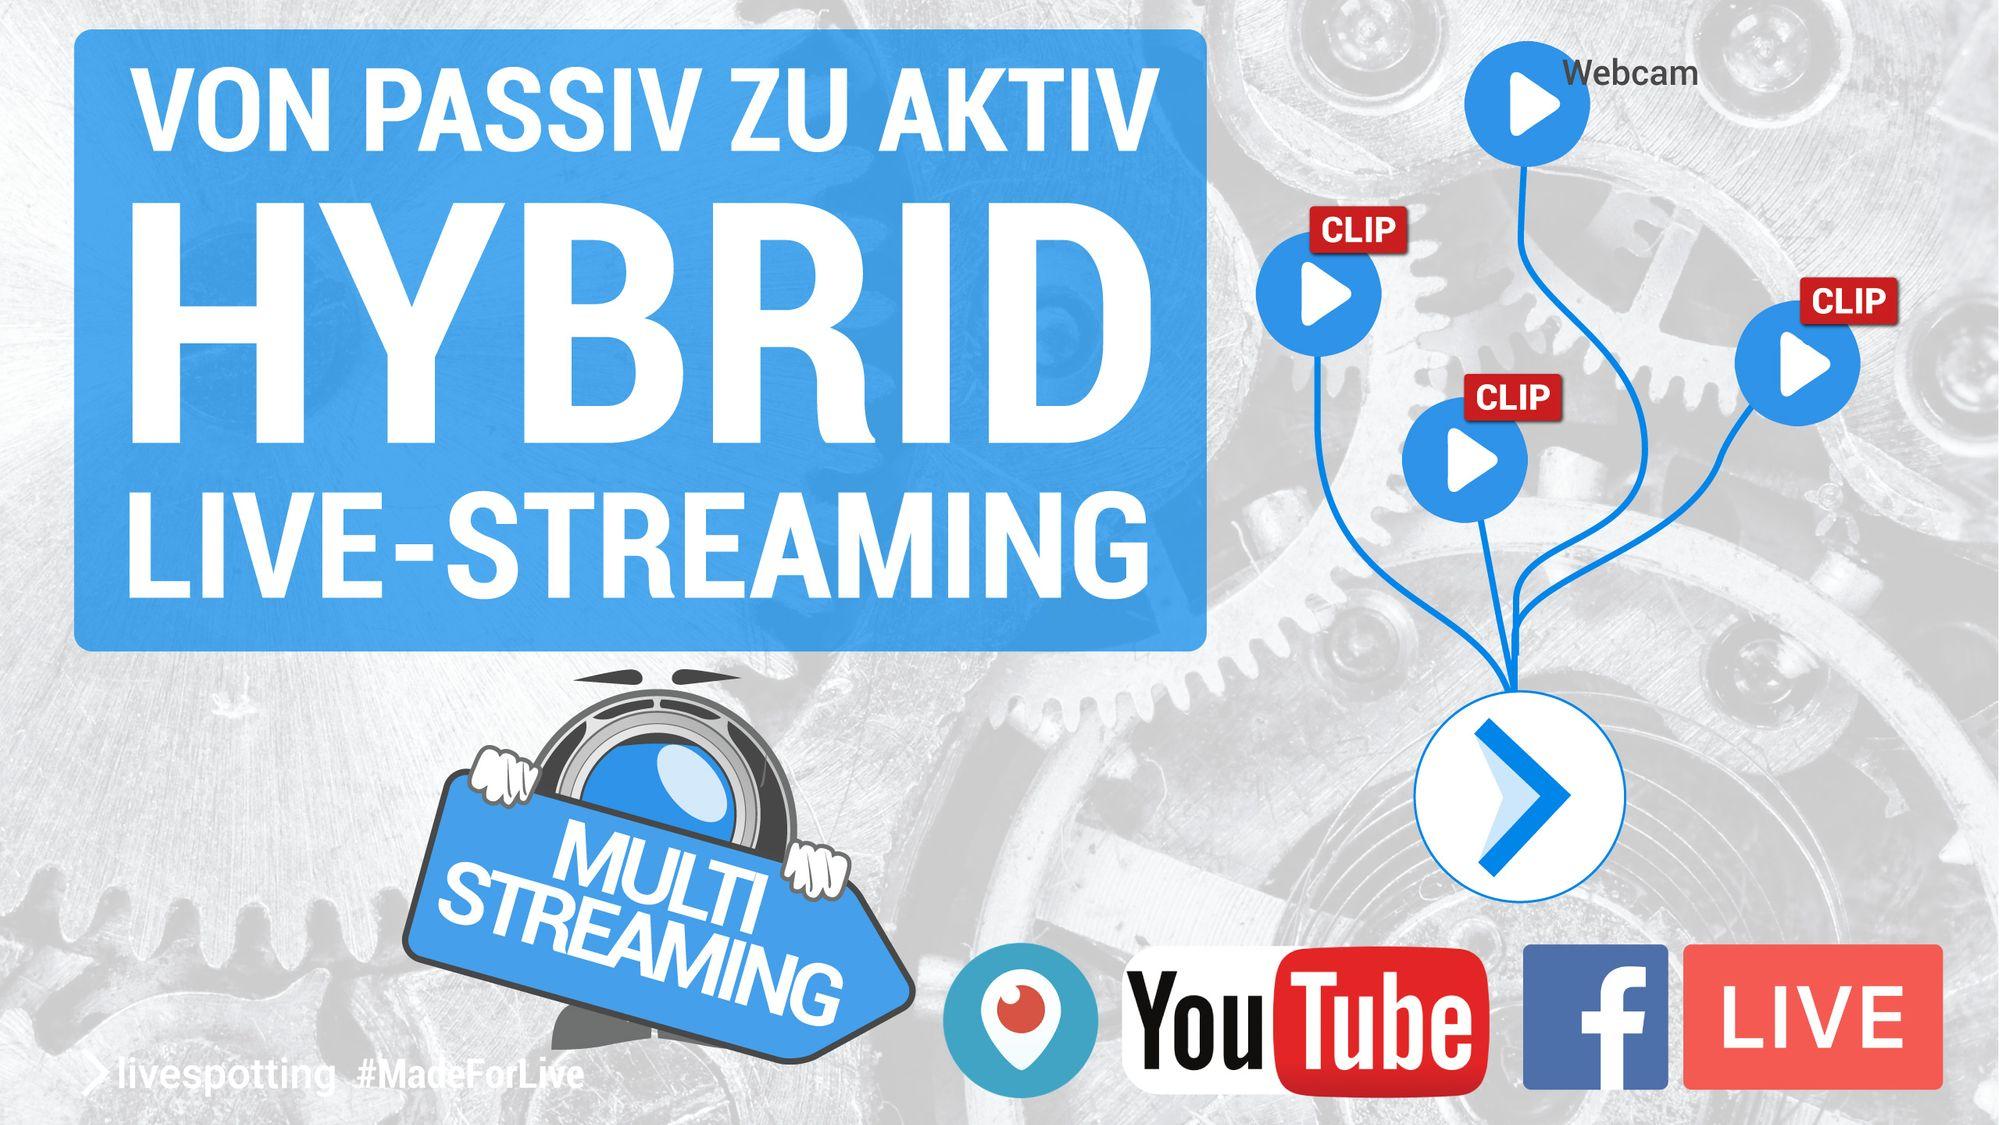 Live-Streaming für Social Media mit Feratel und IT WMS Webcams.